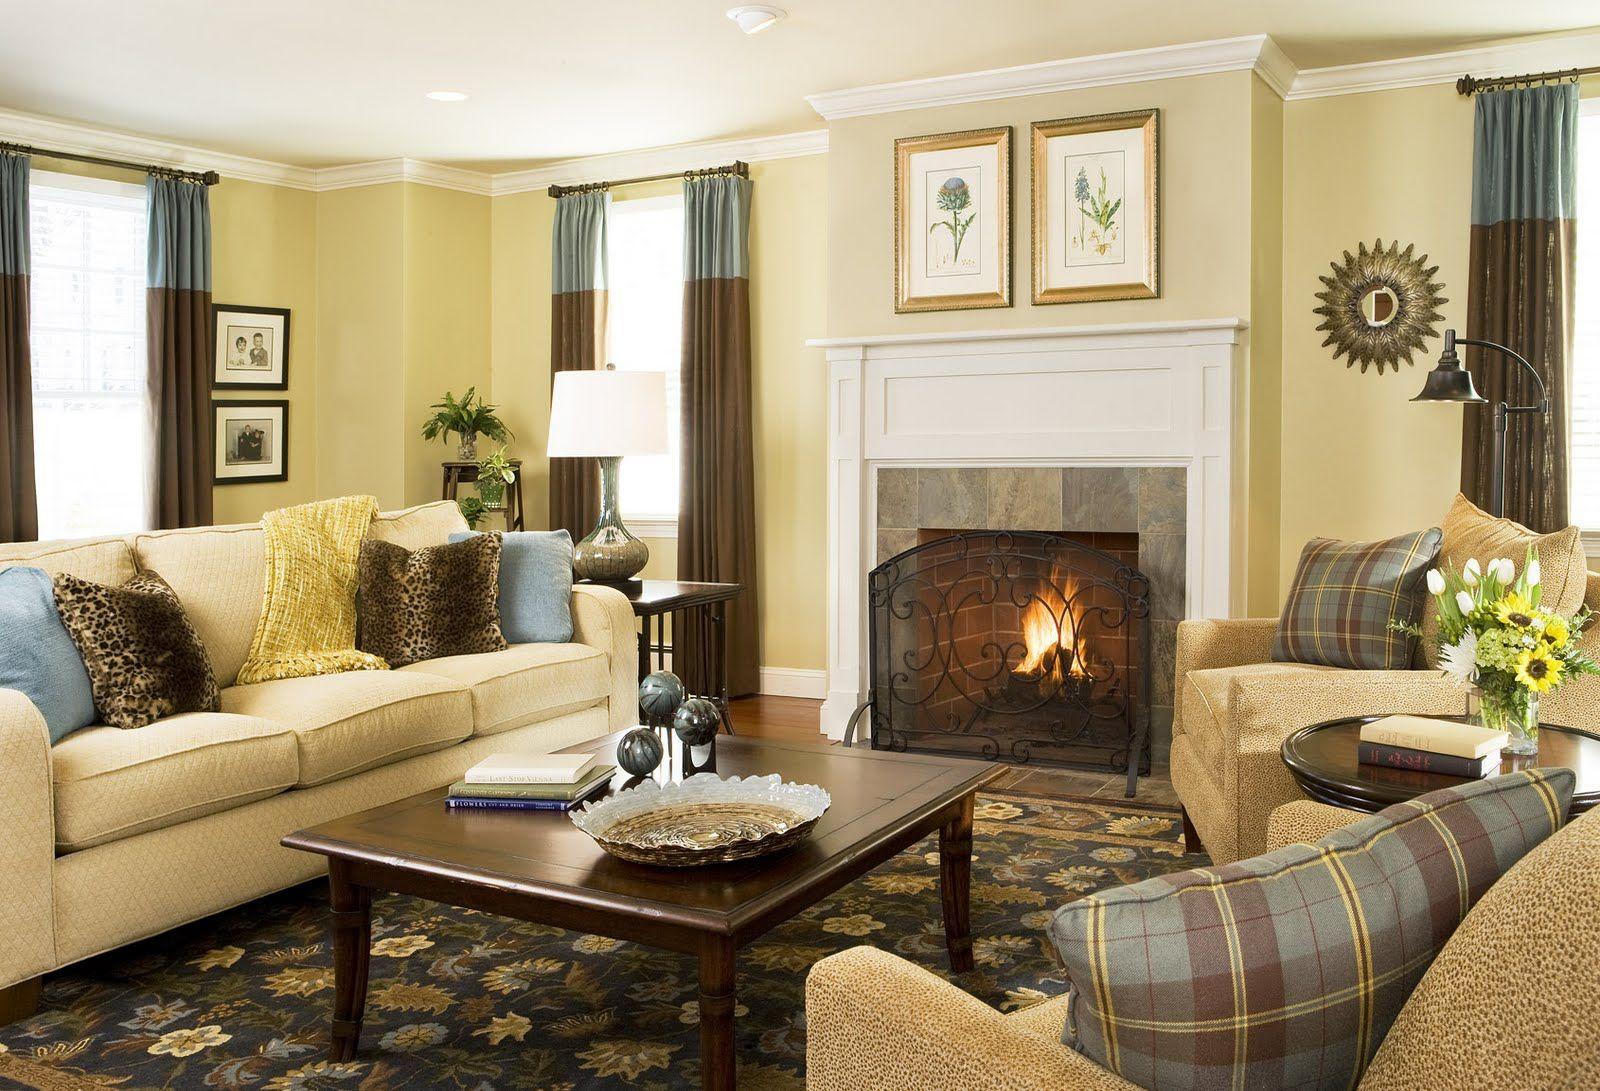 Connie Rice - Dec Den: Three Sure Fire Decorating Ideas | decoracion ...